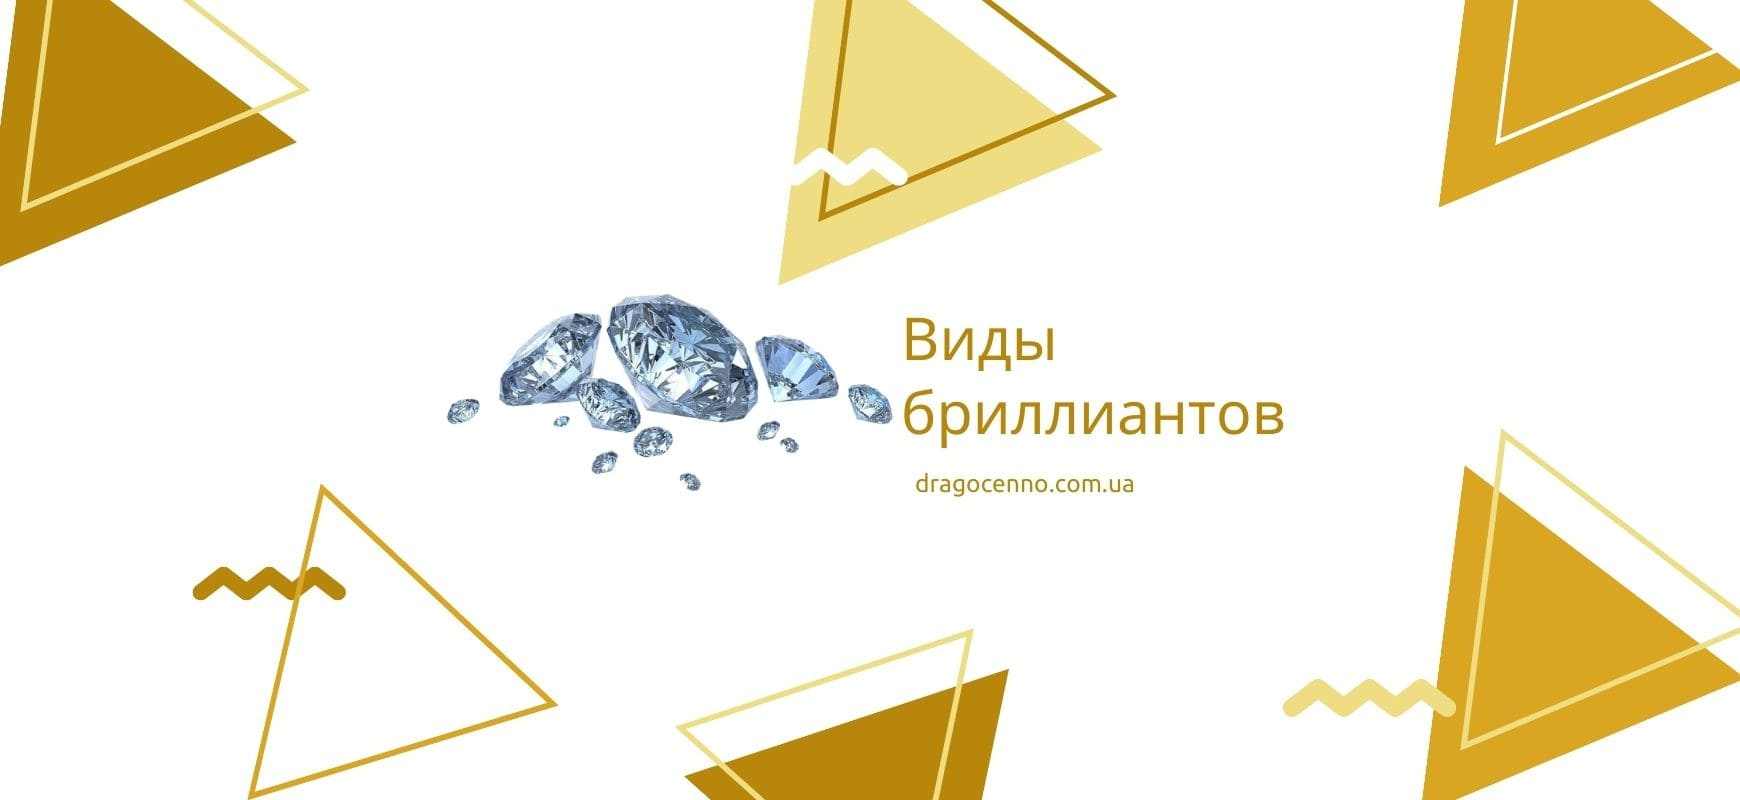 Виды бриллиантов